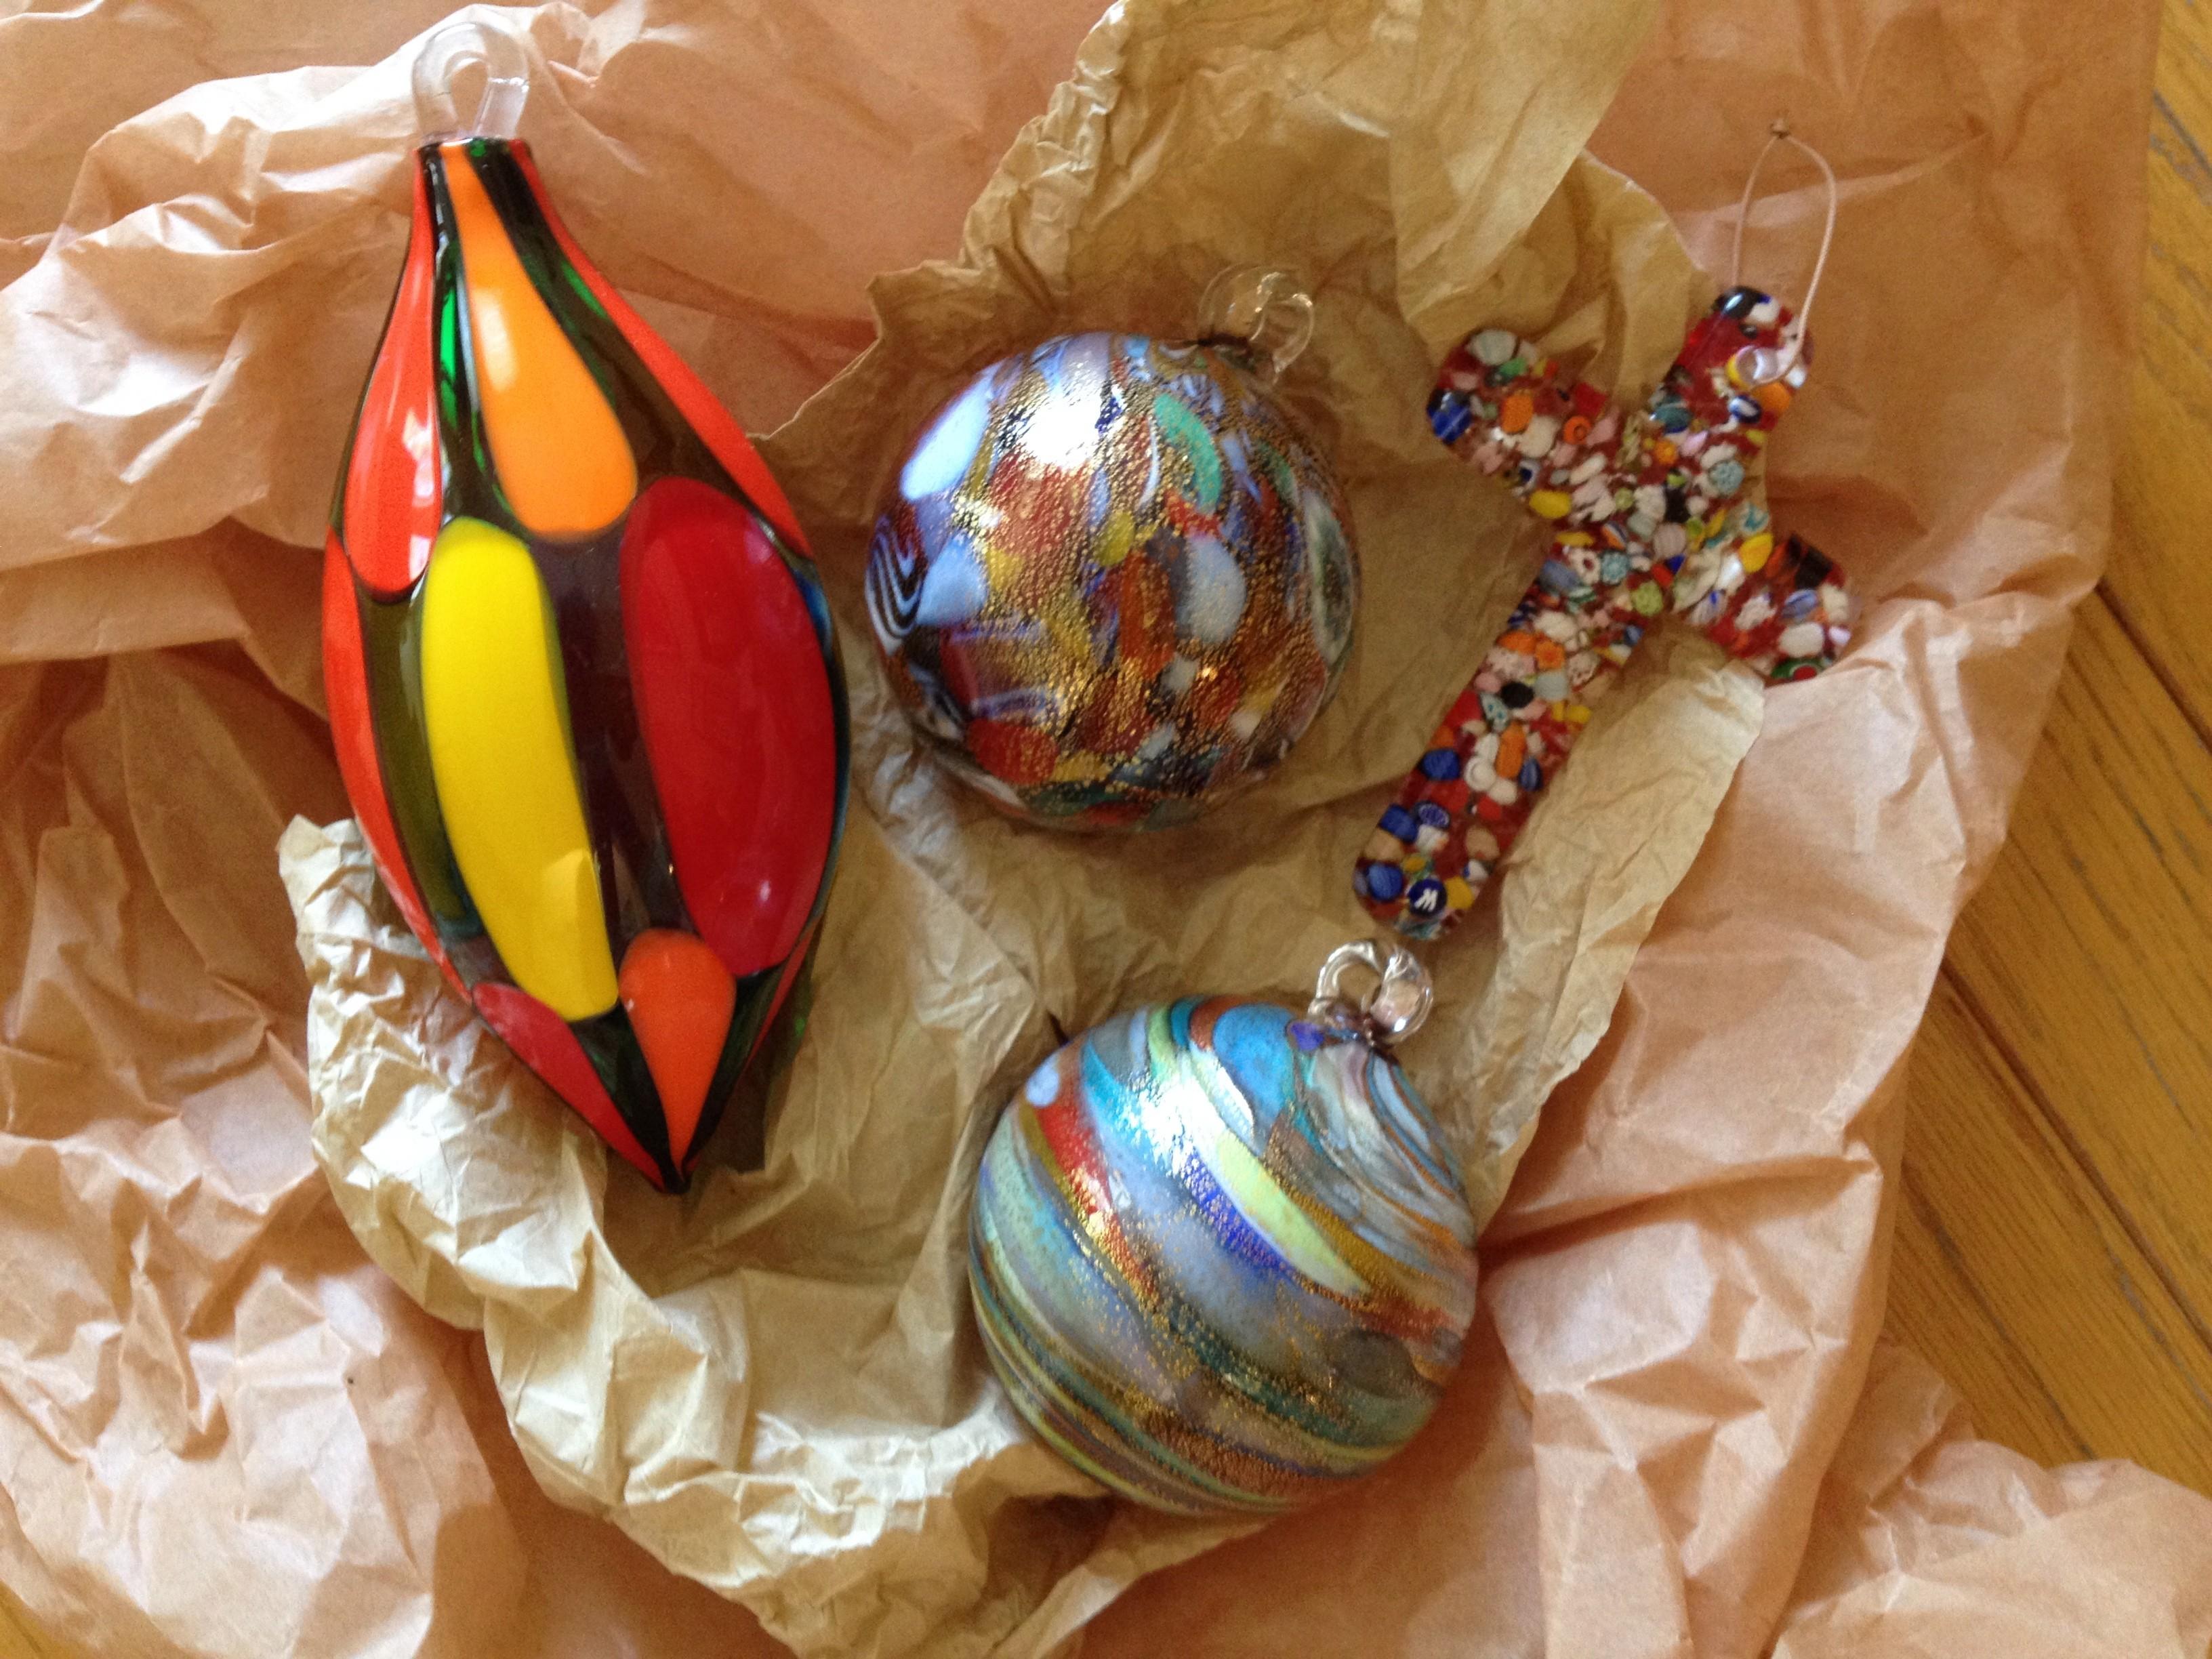 Murano glass ornaments reindeer dreams christmas blog - Murano glass ornaments italy ...